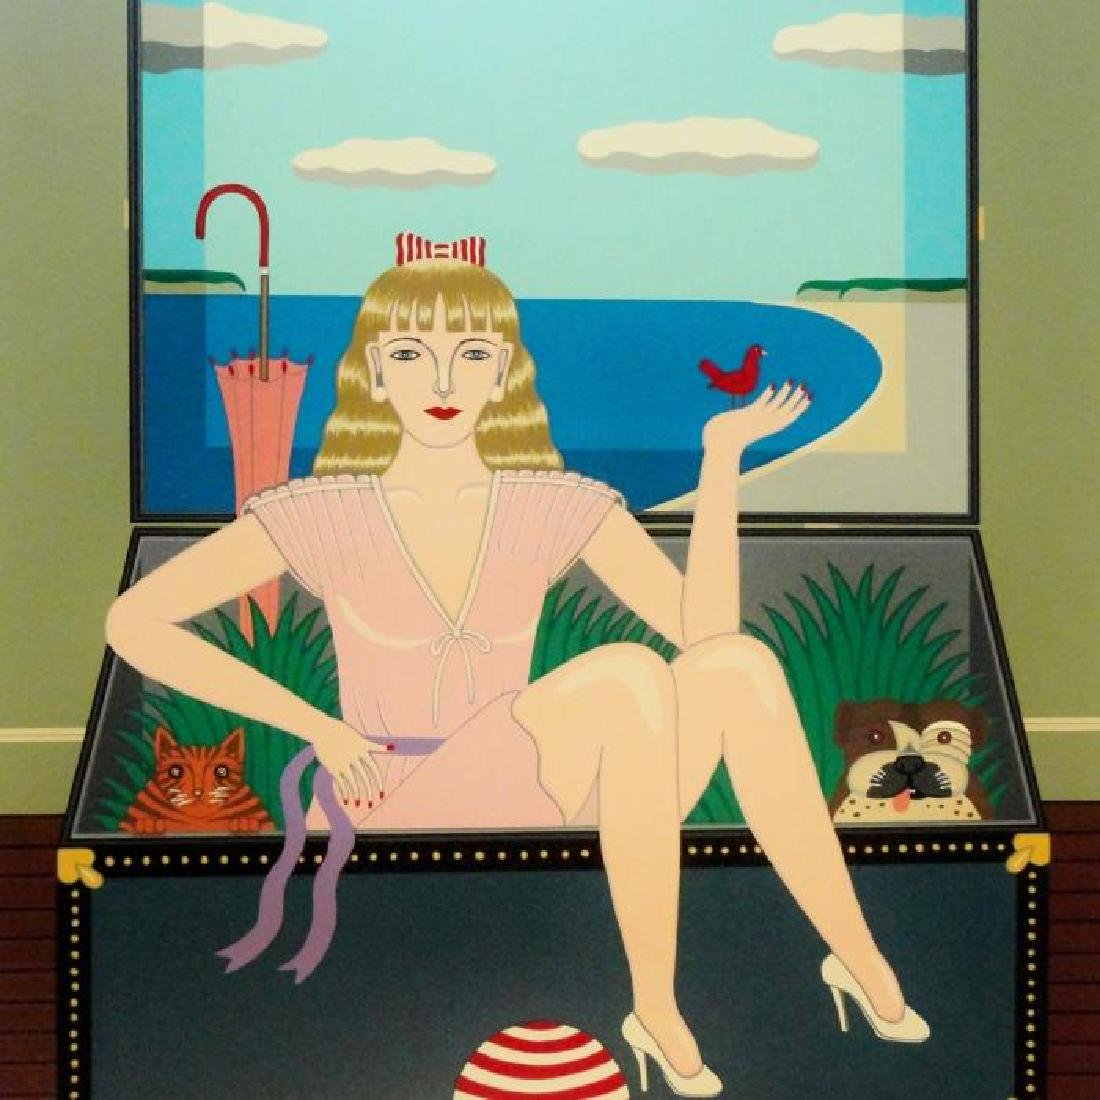 Okumura Art Deco Woman In Trunk Surreal Pop Style Ltd - 2